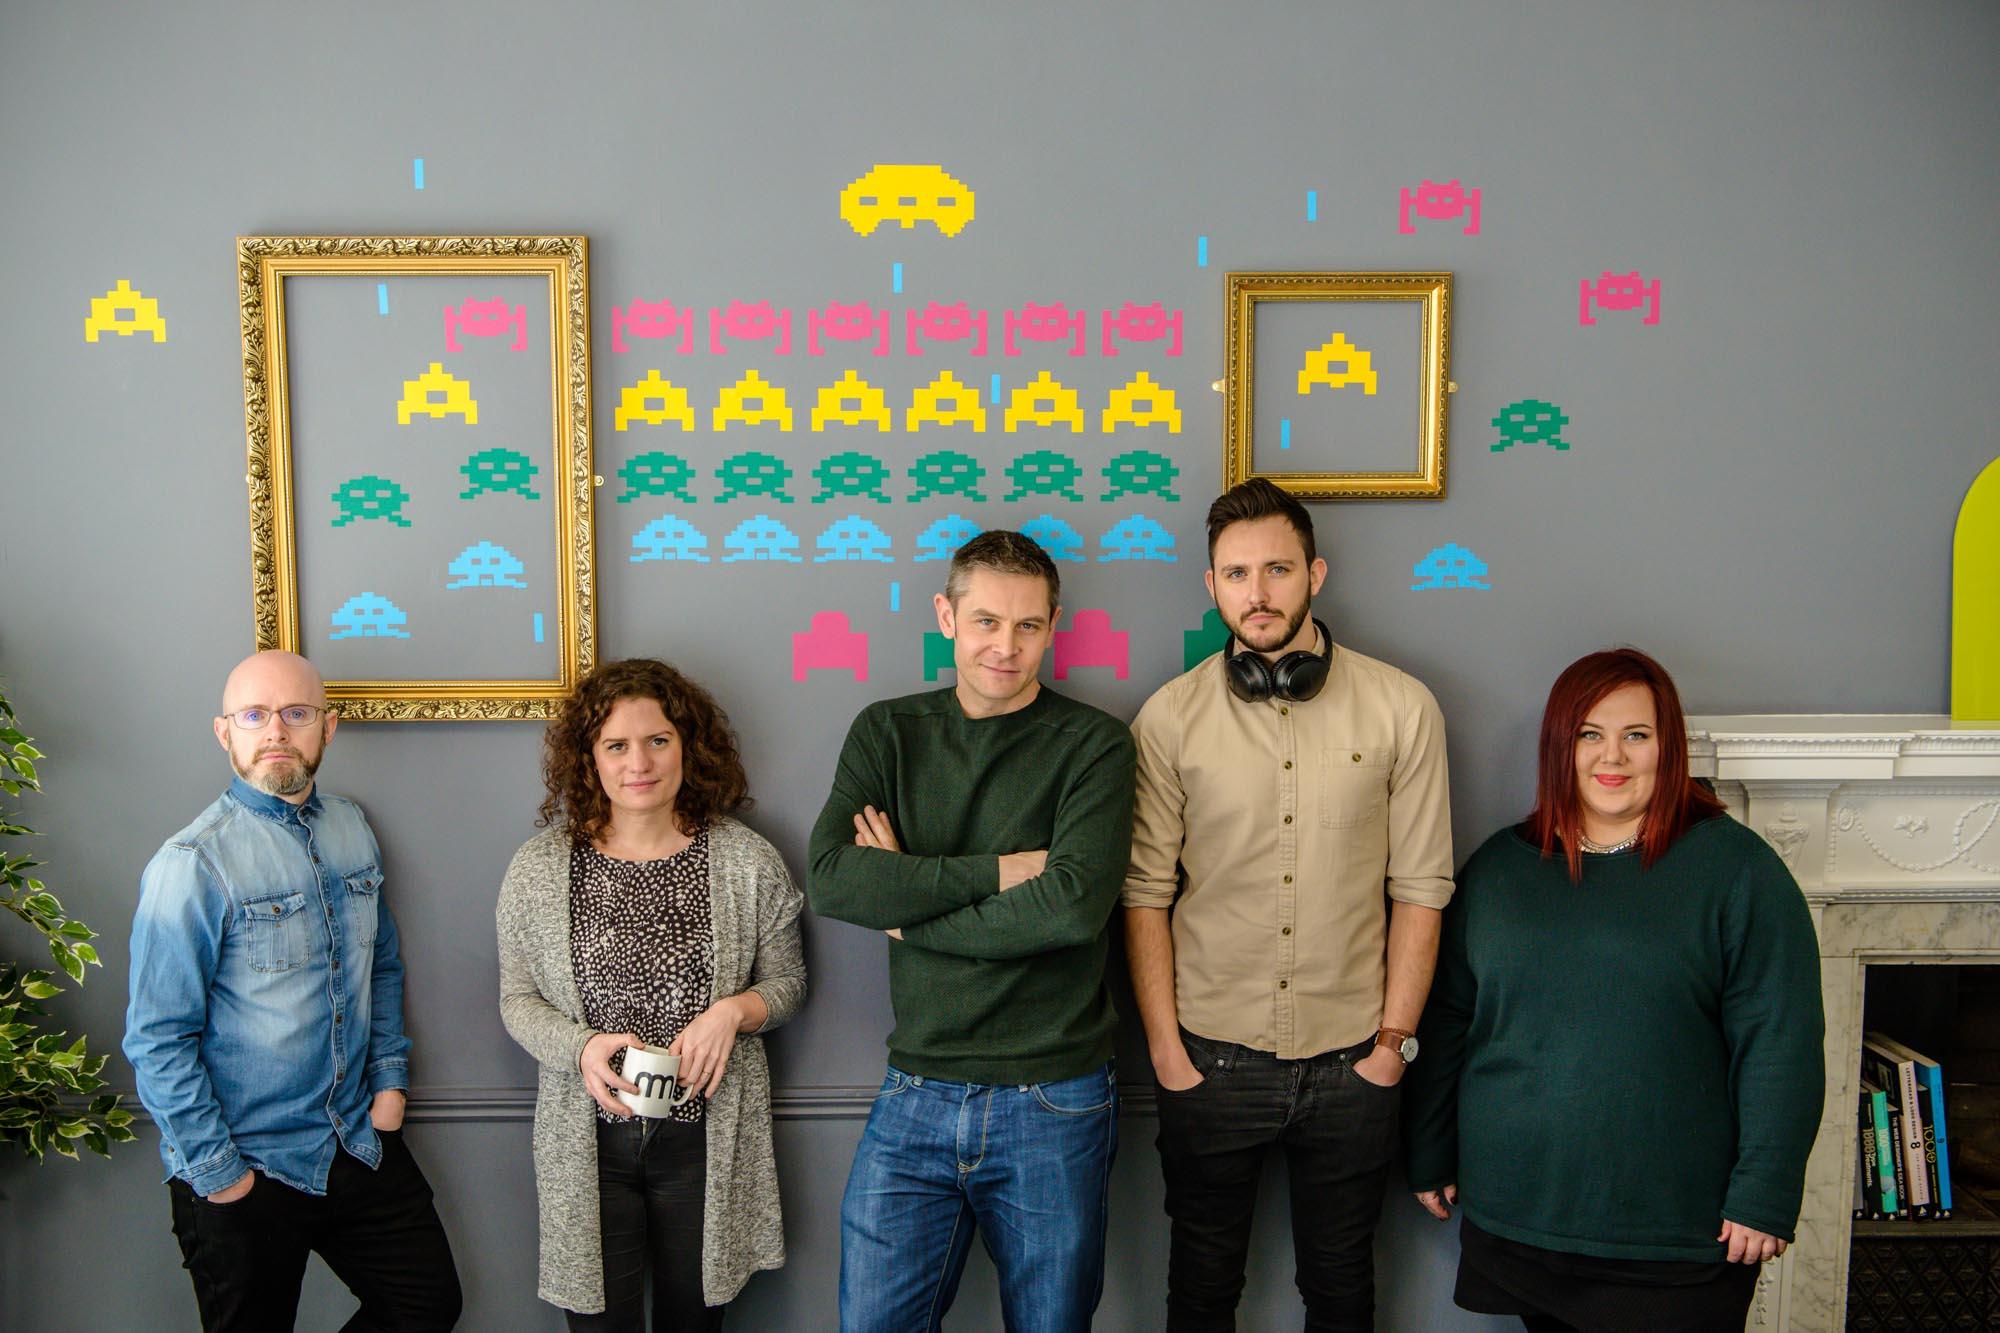 Team Portraits & Marketing Photography Coventry Warwickshire Birmingham Midlands Photographer UK